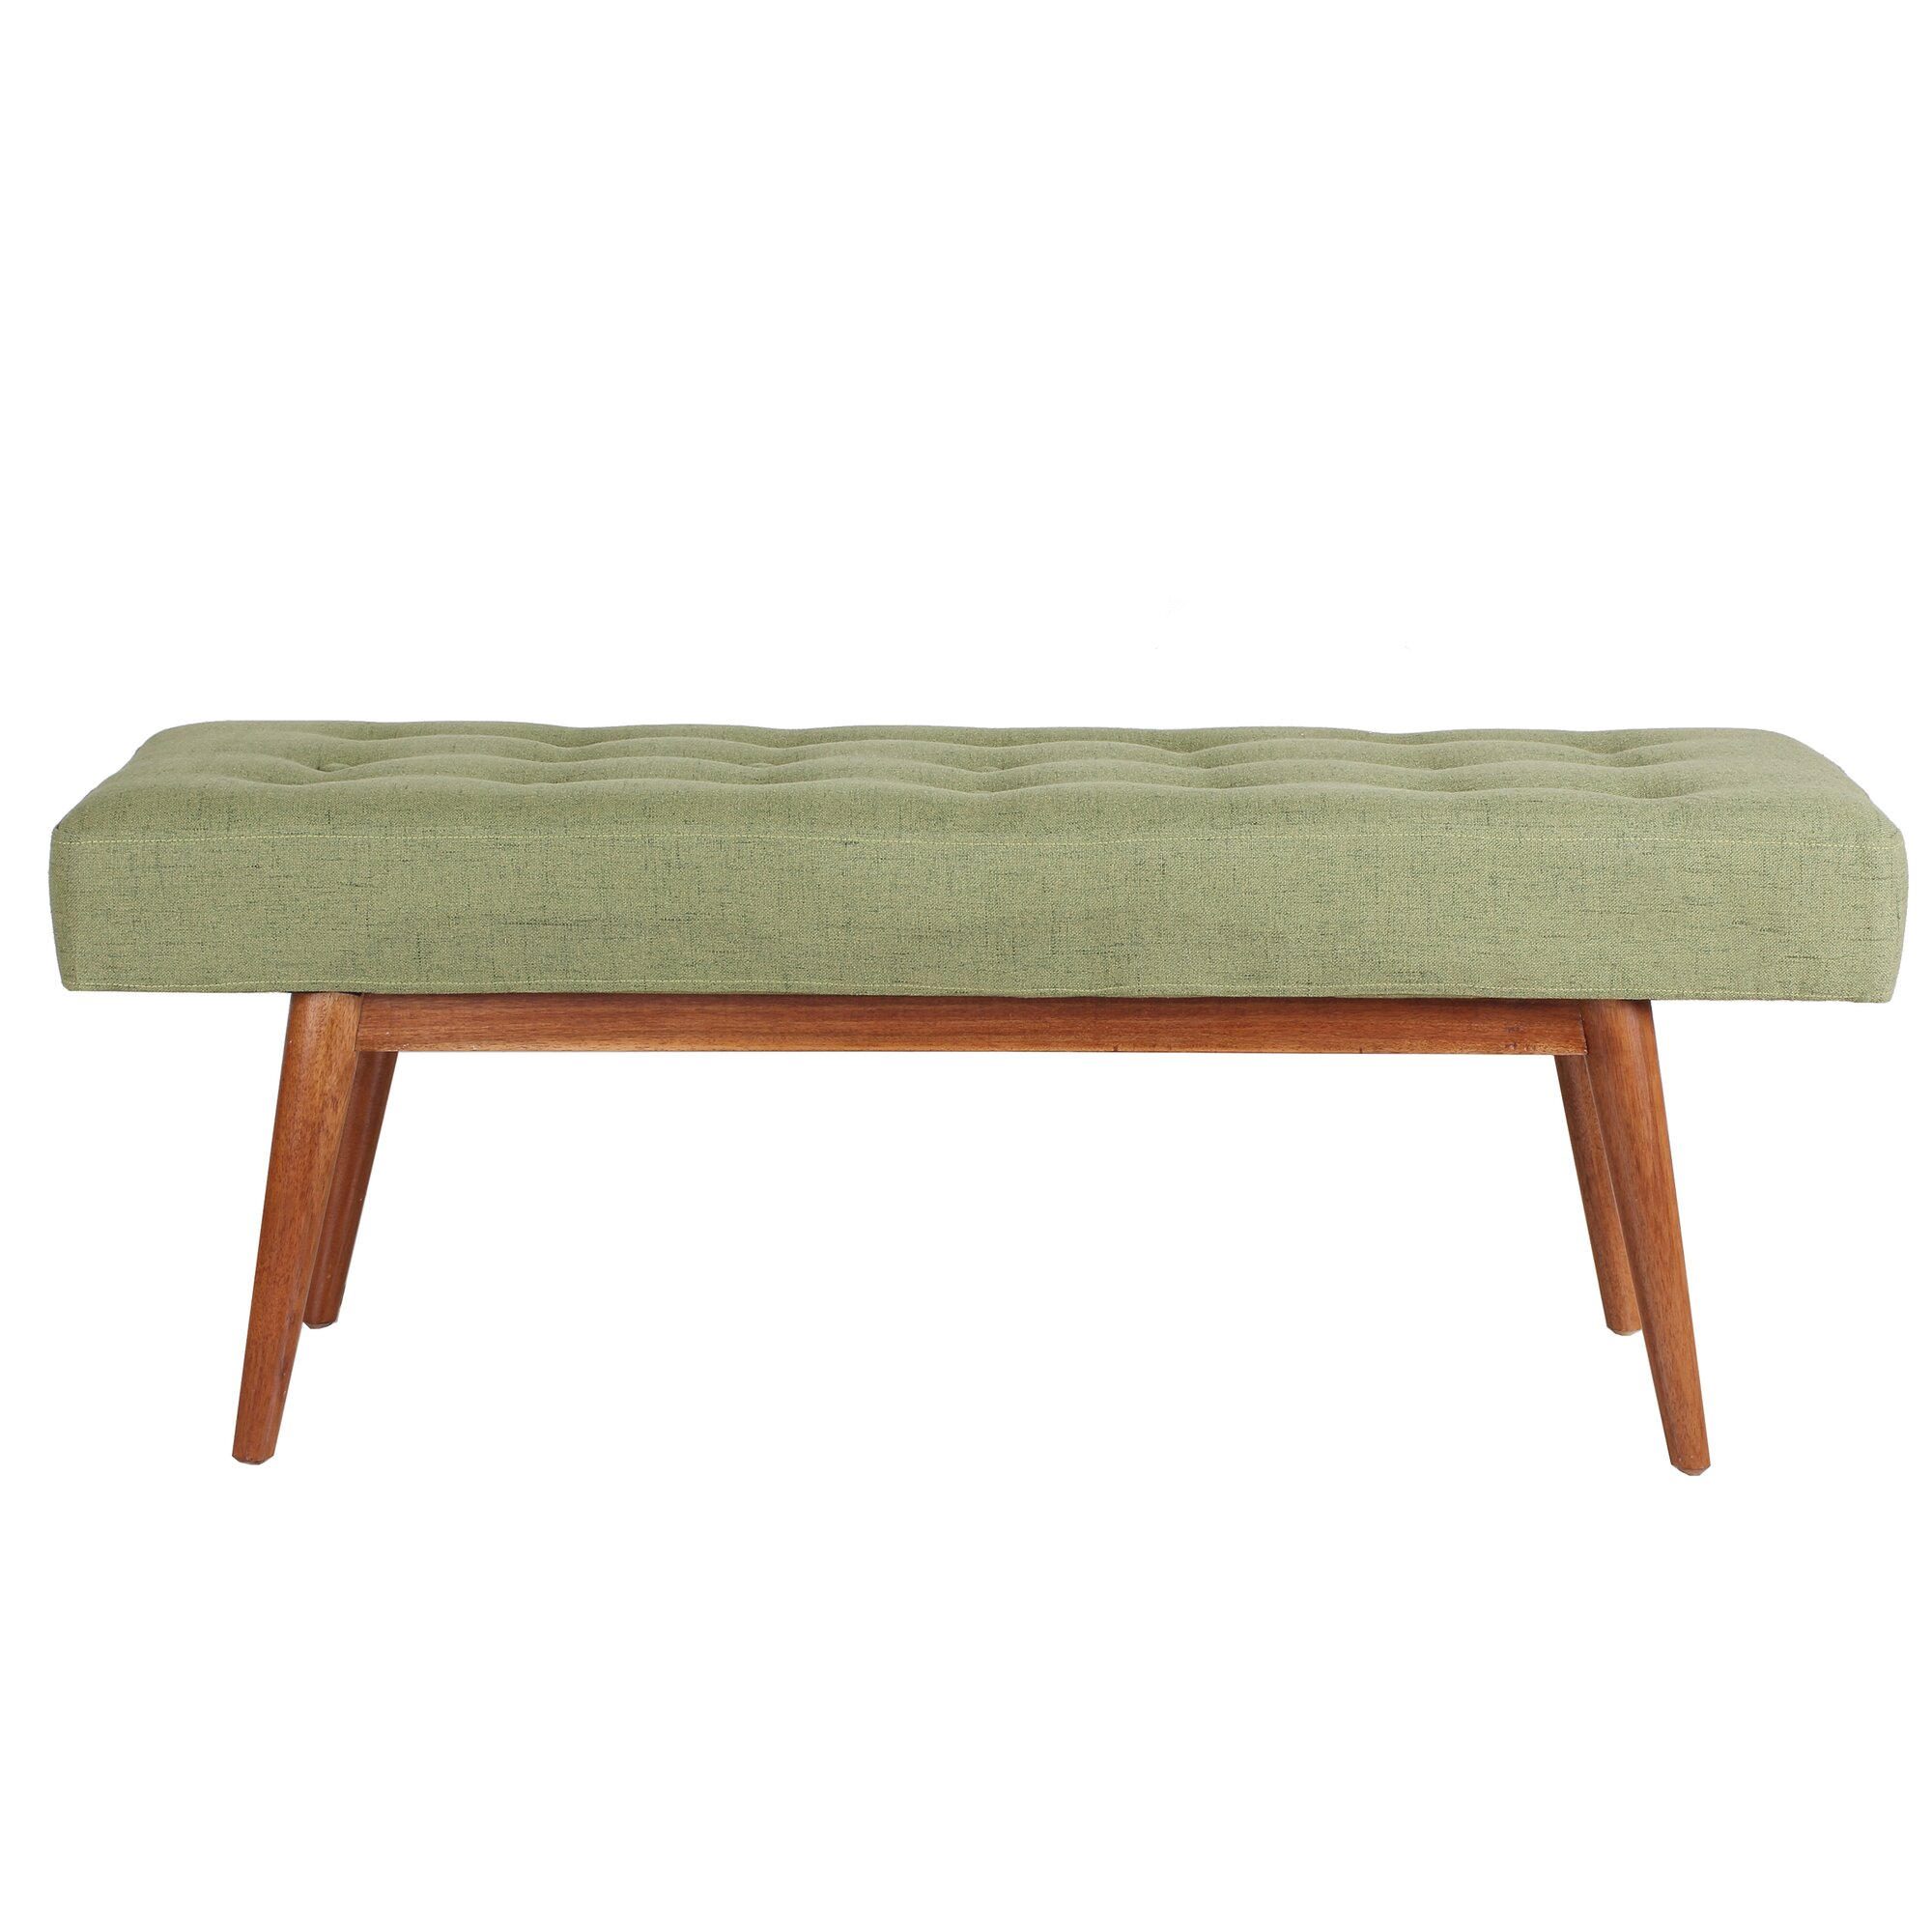 Bedroom bench with arms - Bedroom Bench With Arms 16